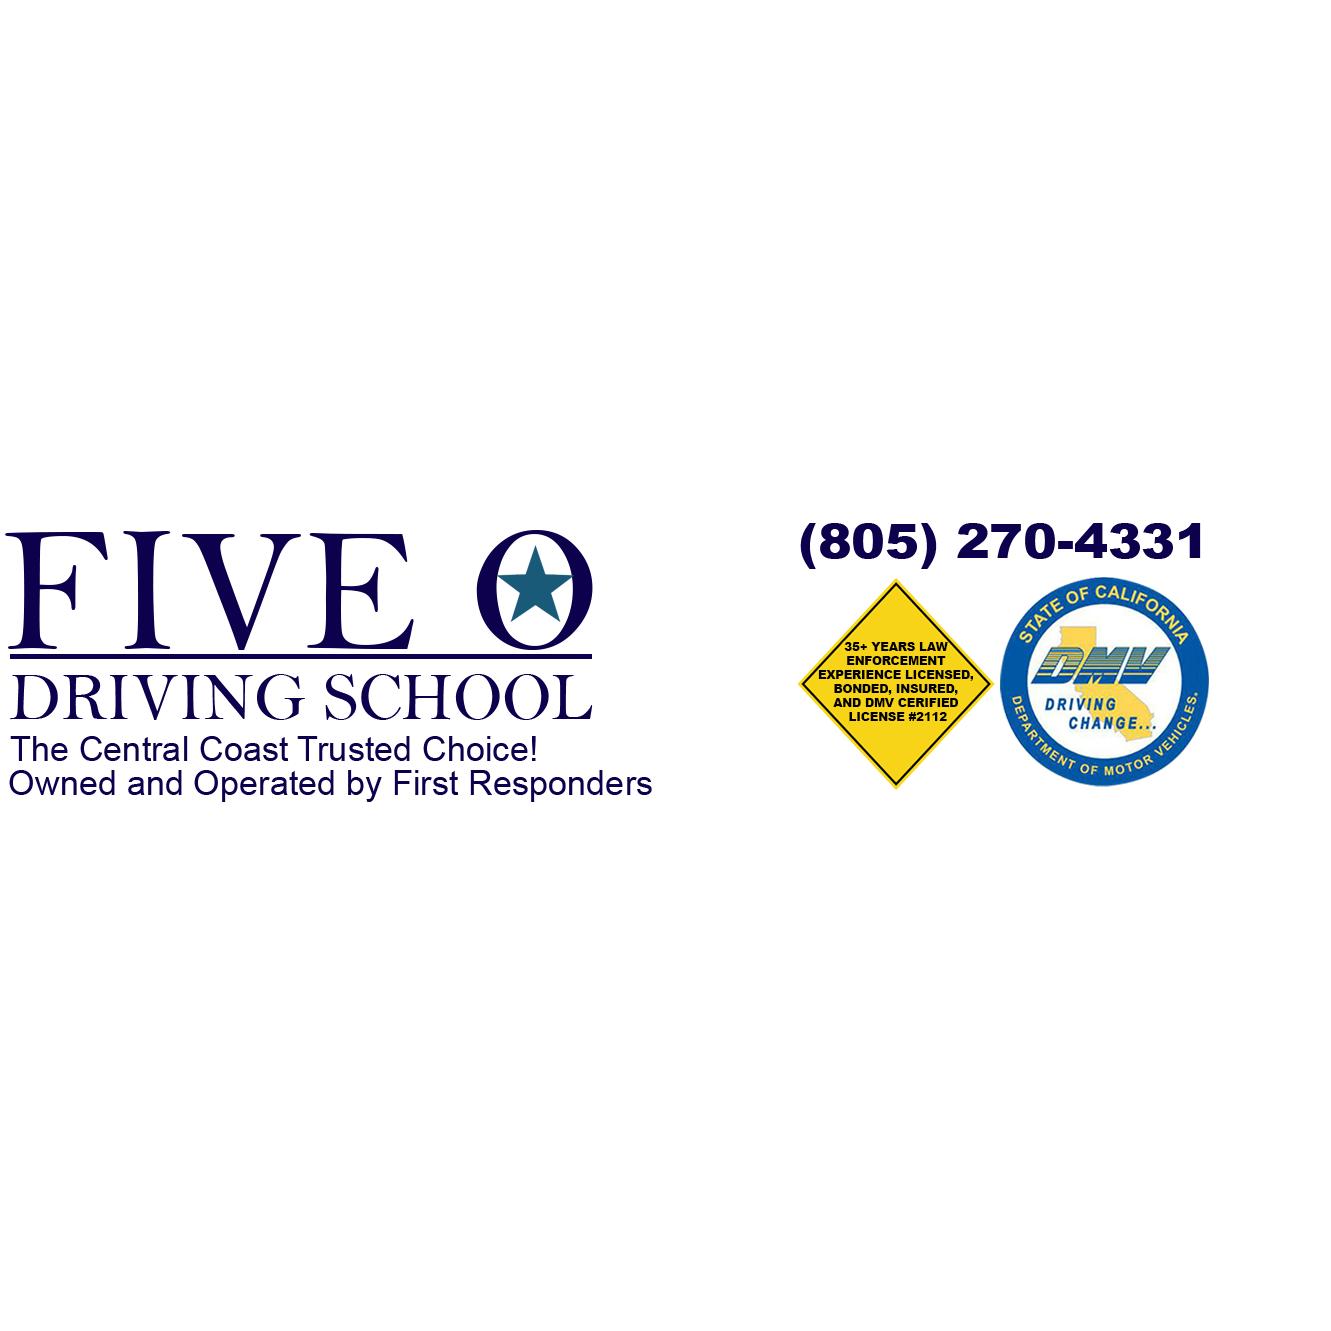 Five O Driving School